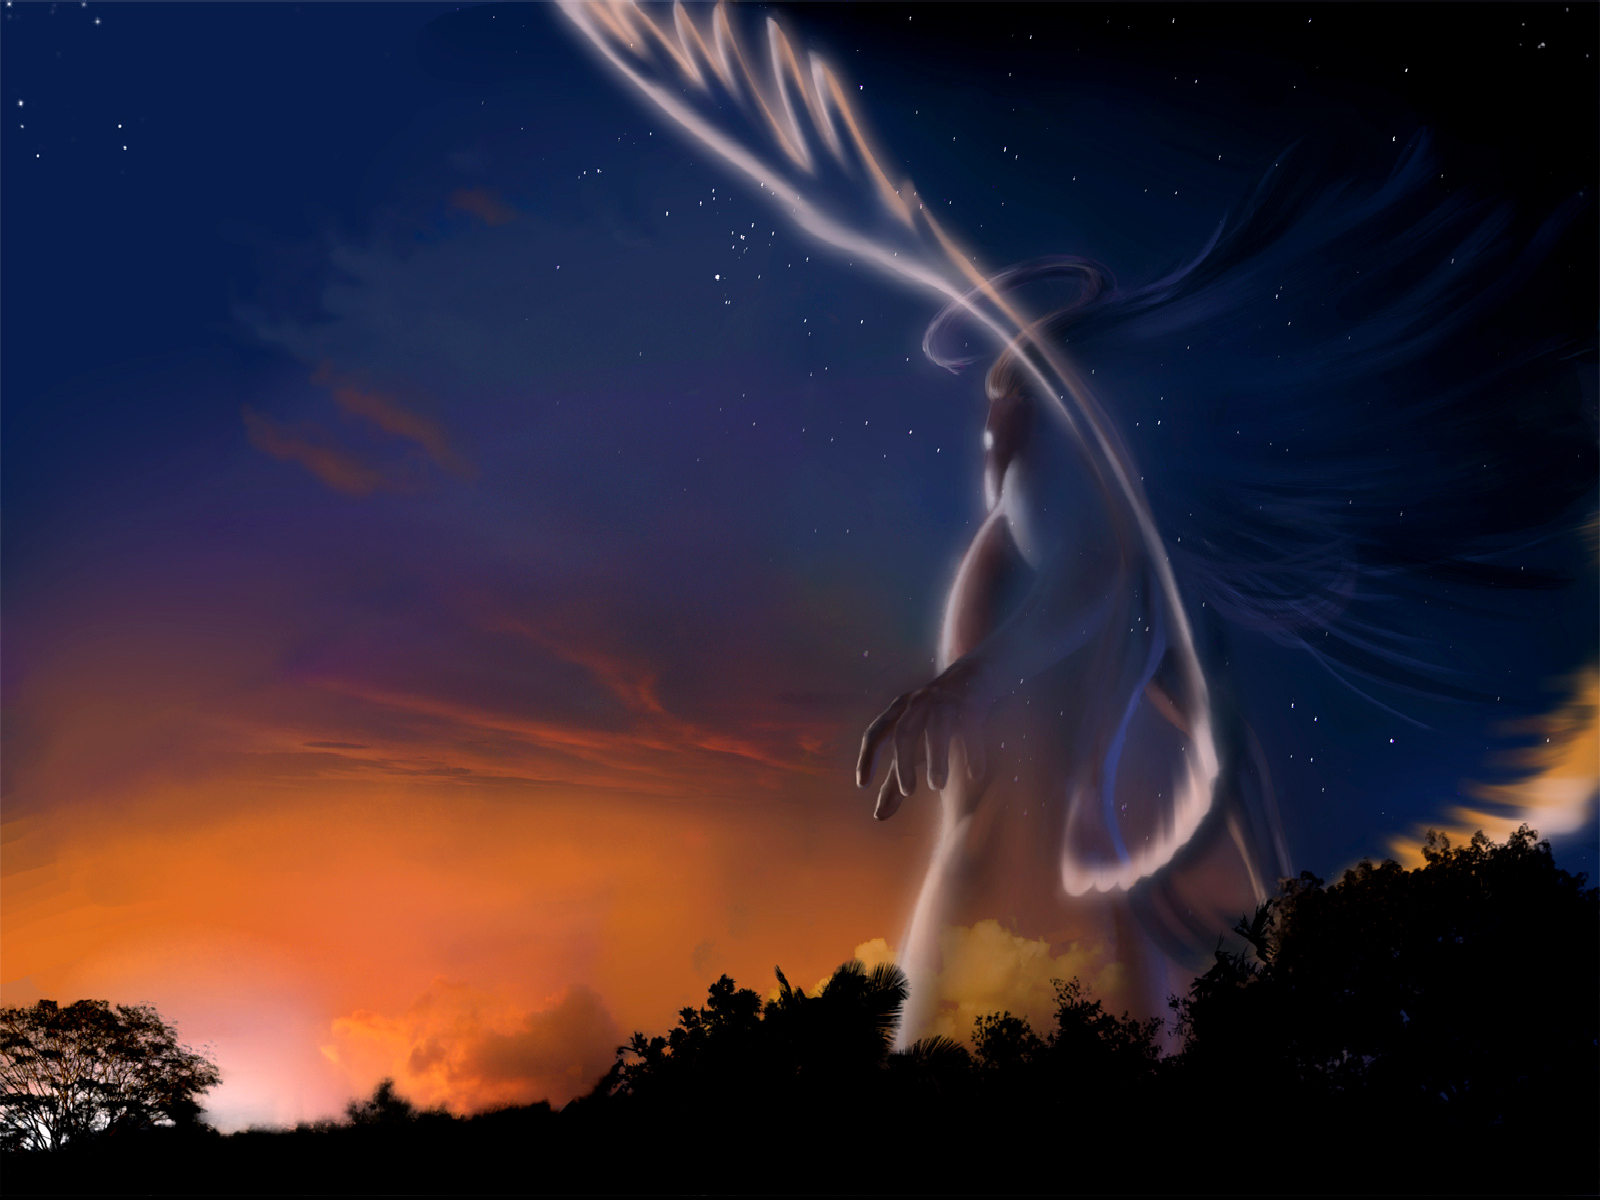 Фэнтези - Ангел  - Демон - Fallen Angel Обои